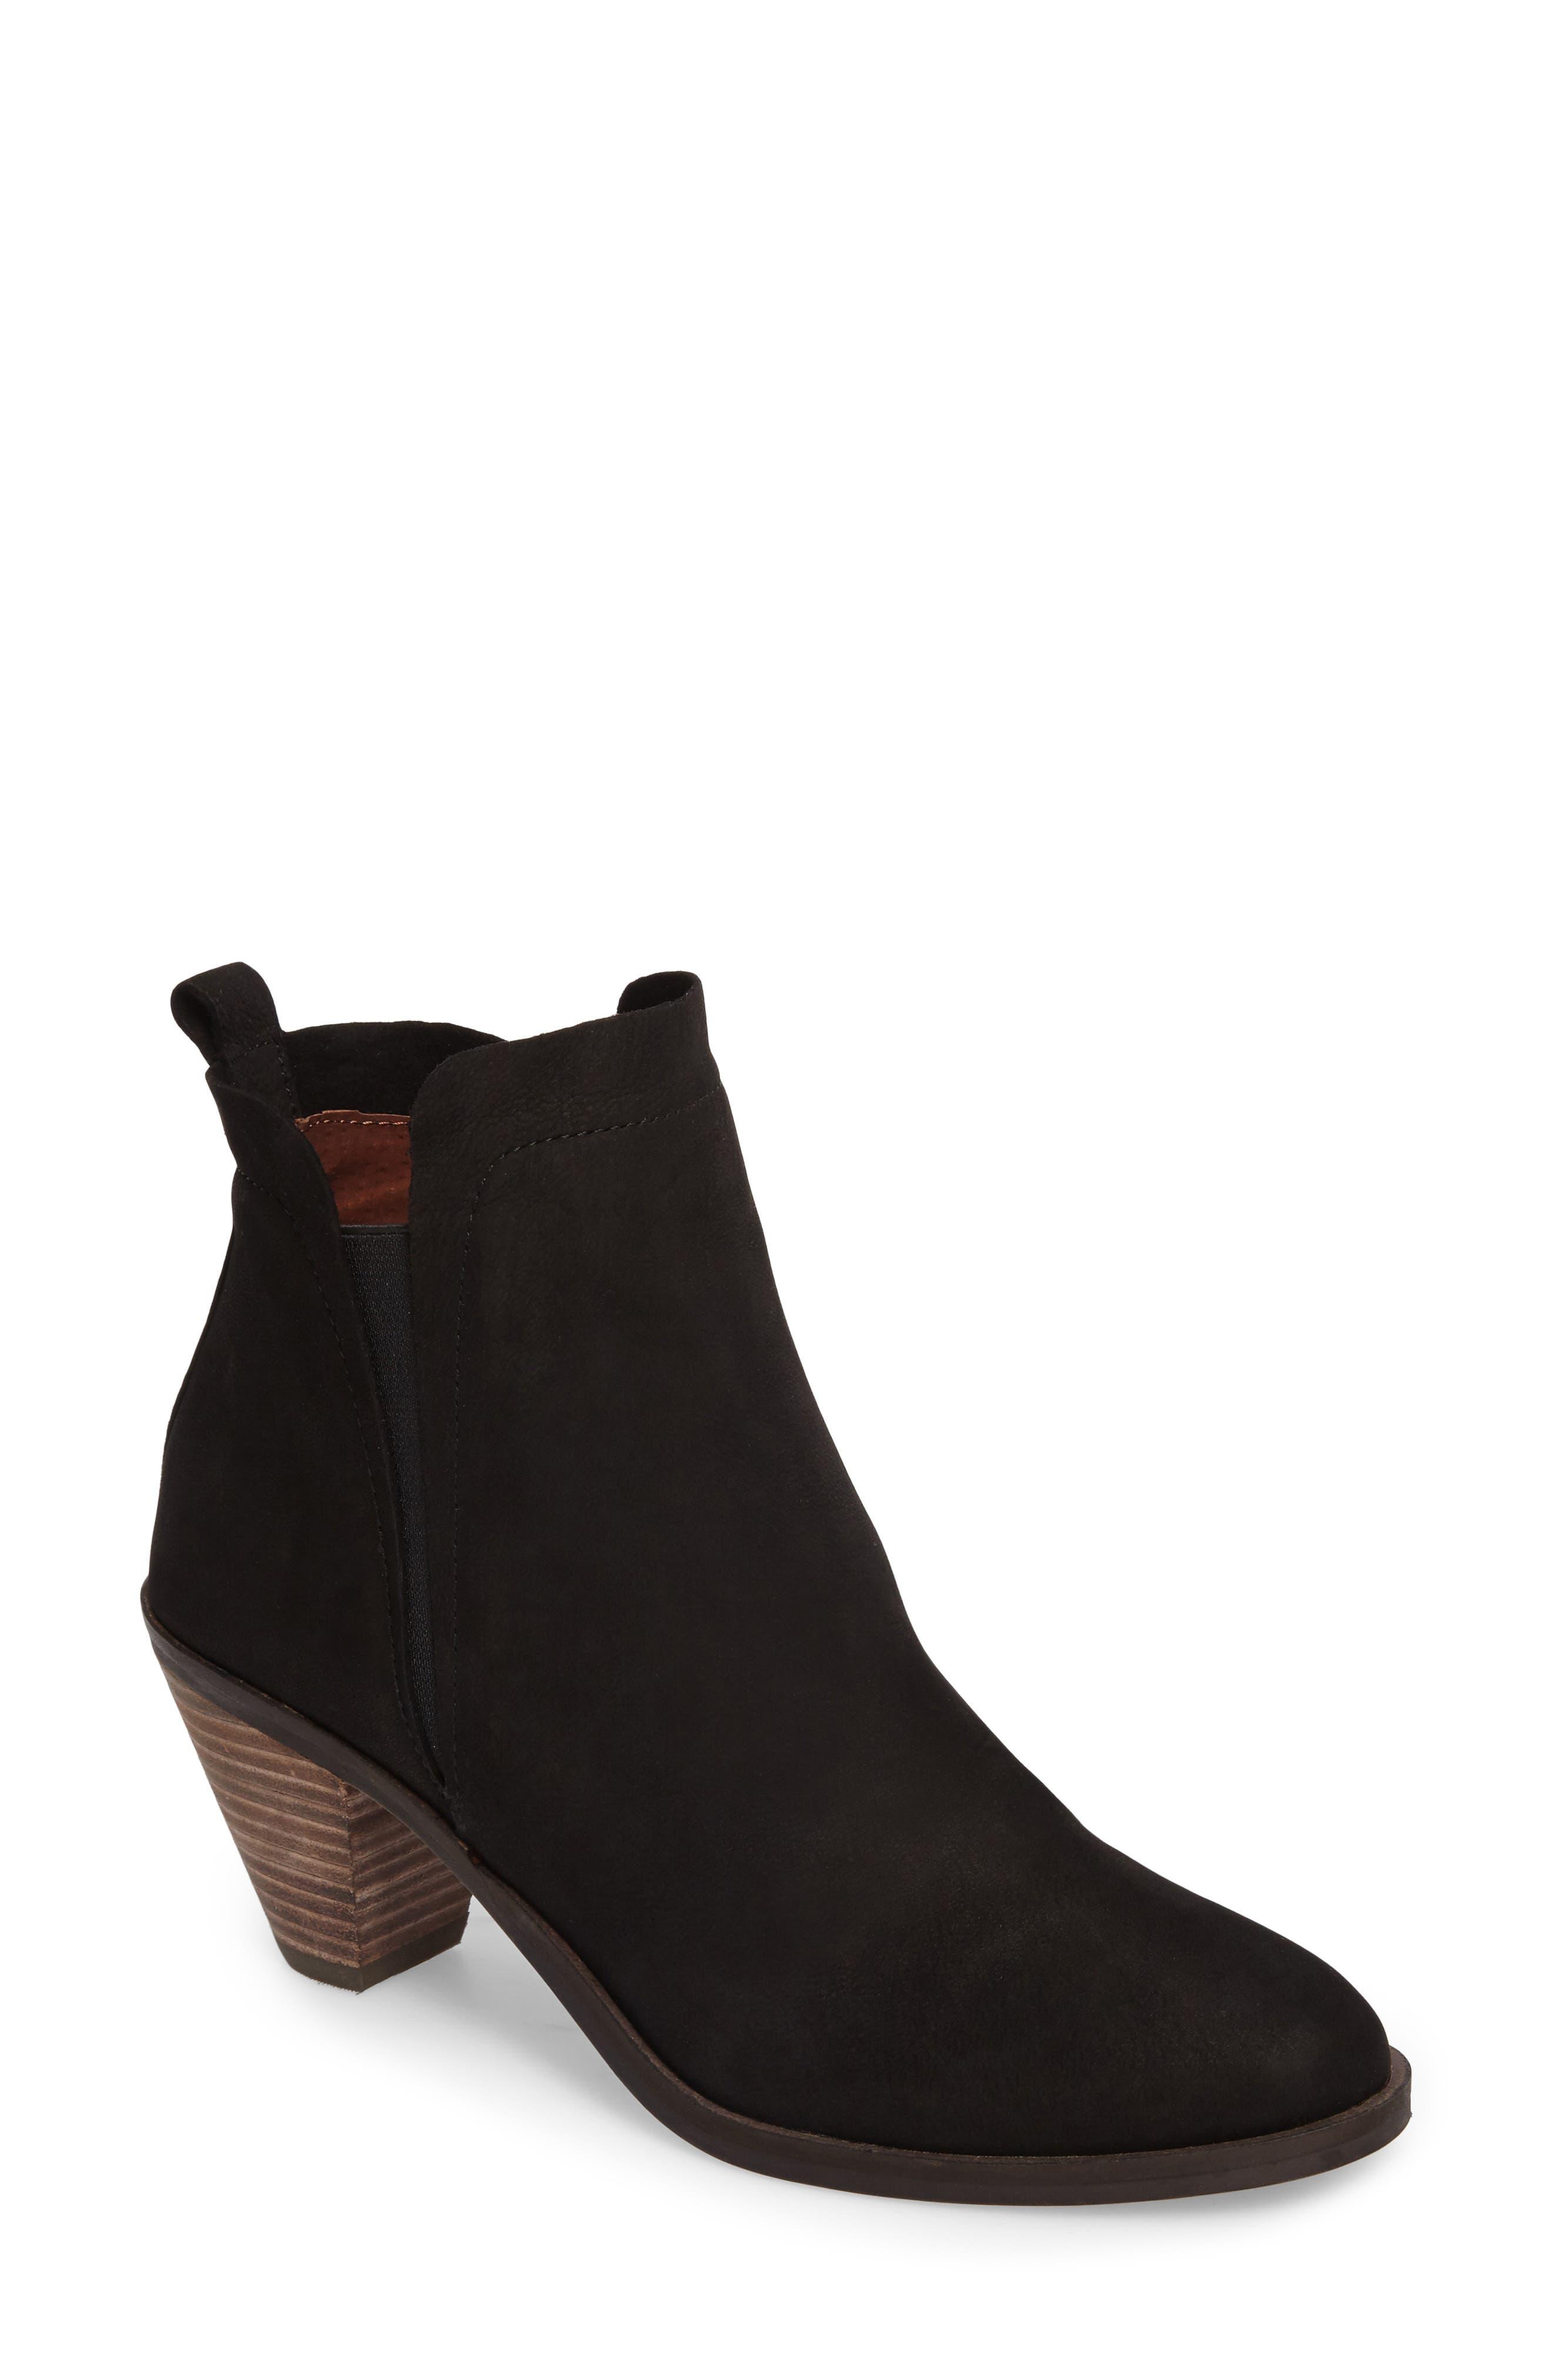 Jana Bootie,                         Main,                         color, Black Leather